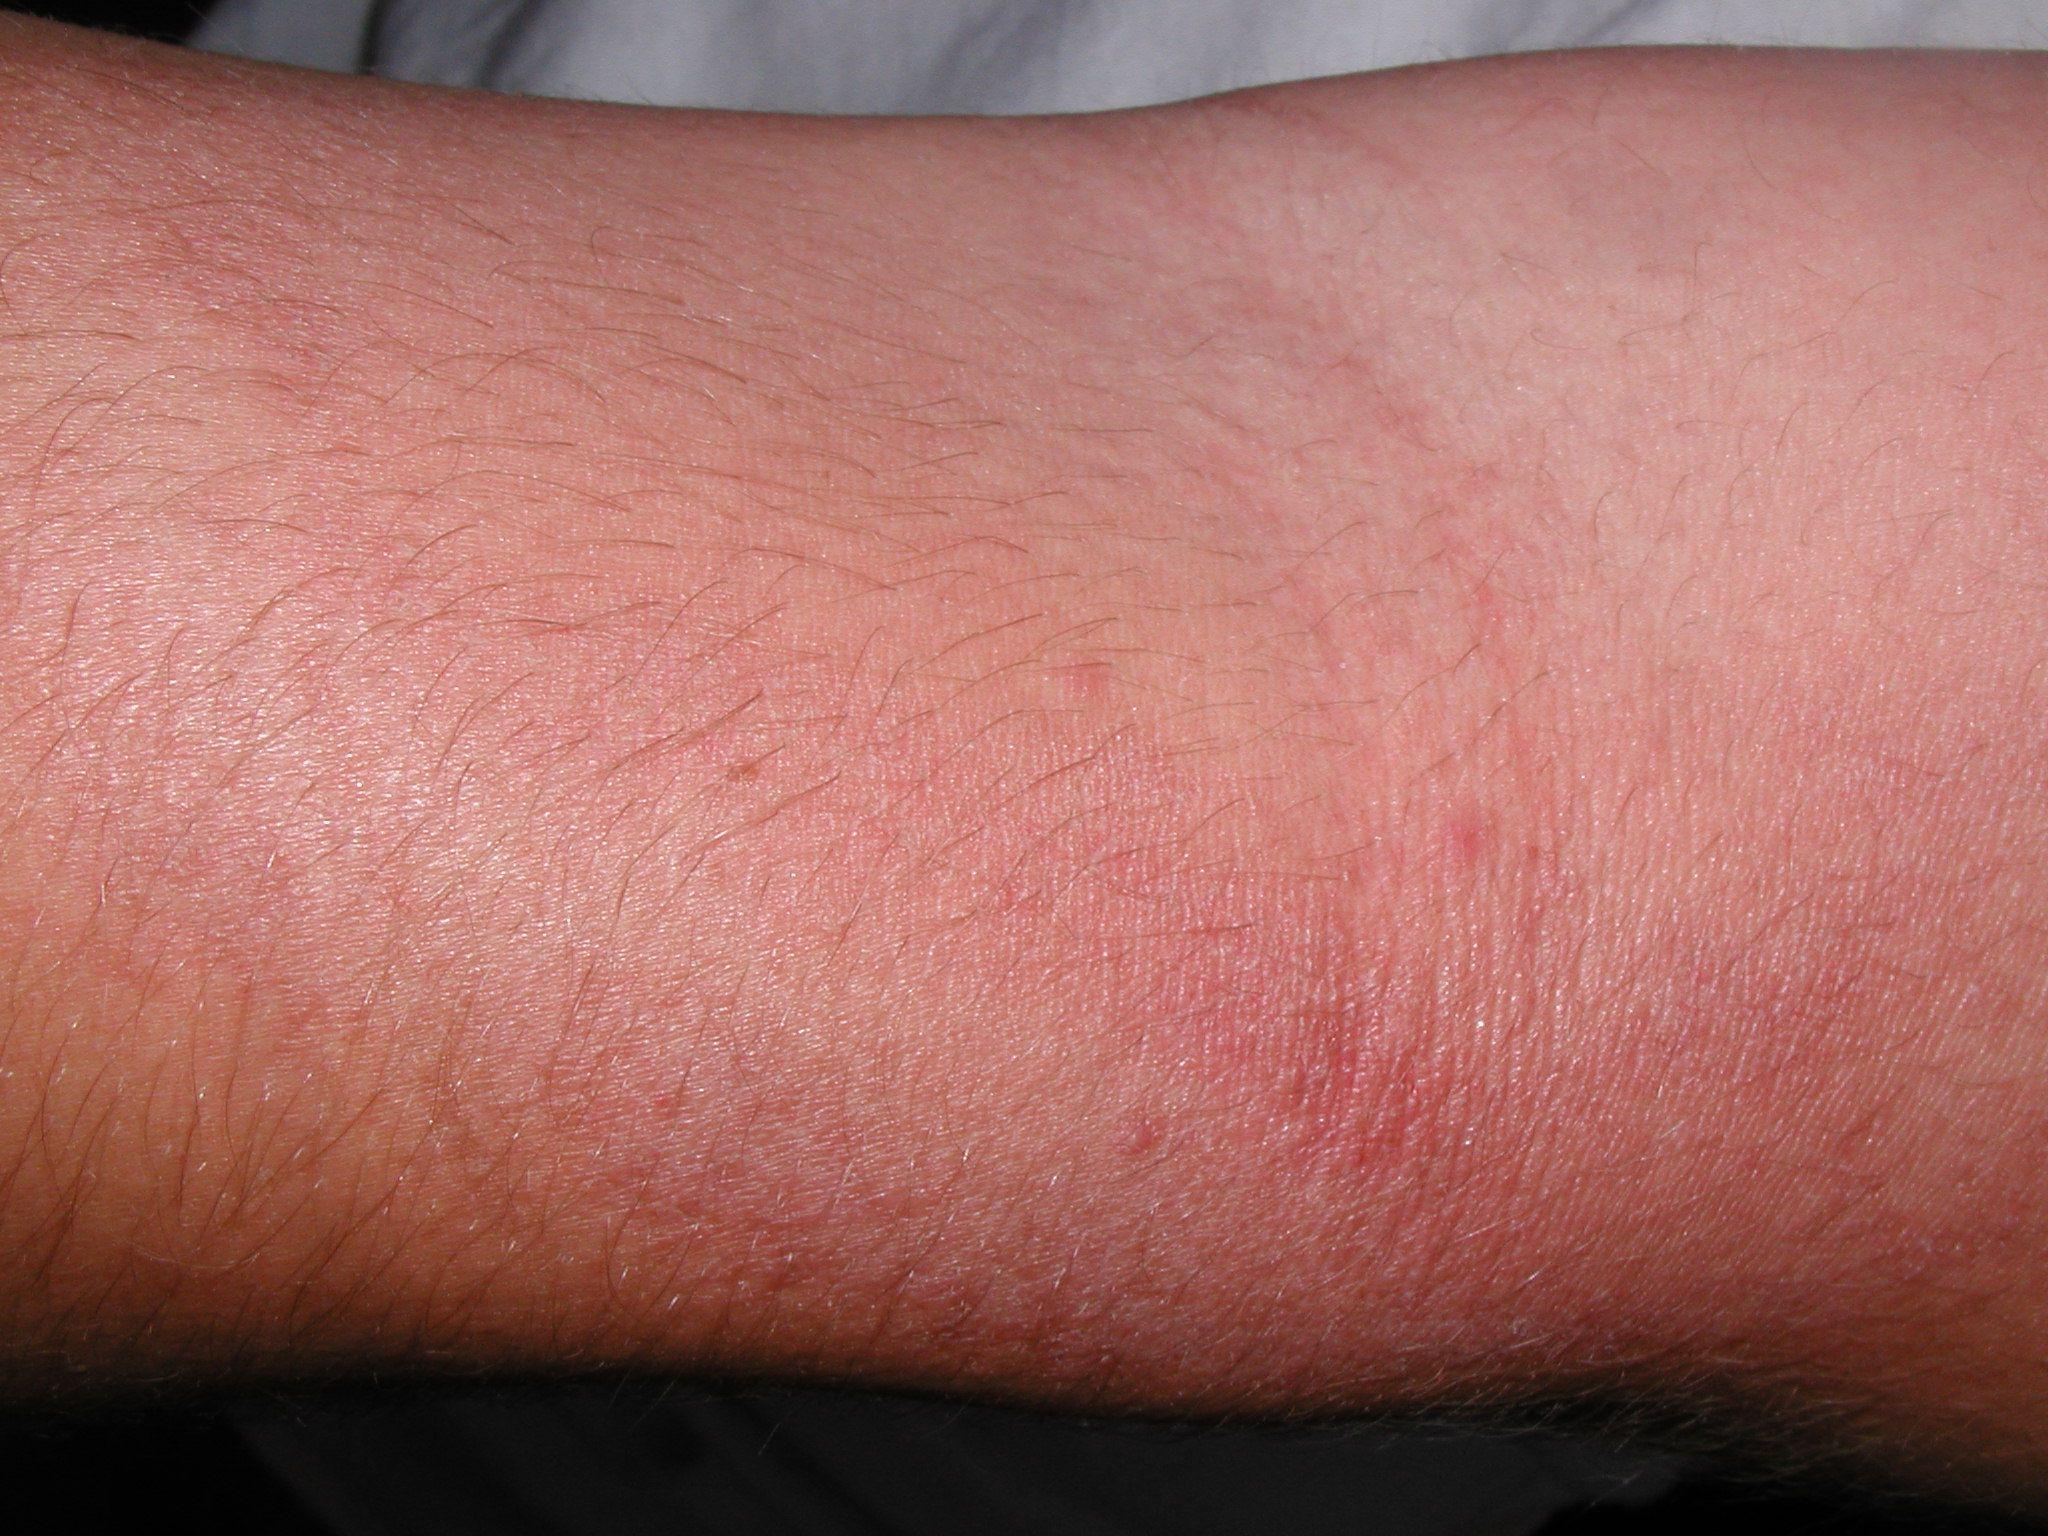 Red bumpy rash on crease of arm | Sarah blog